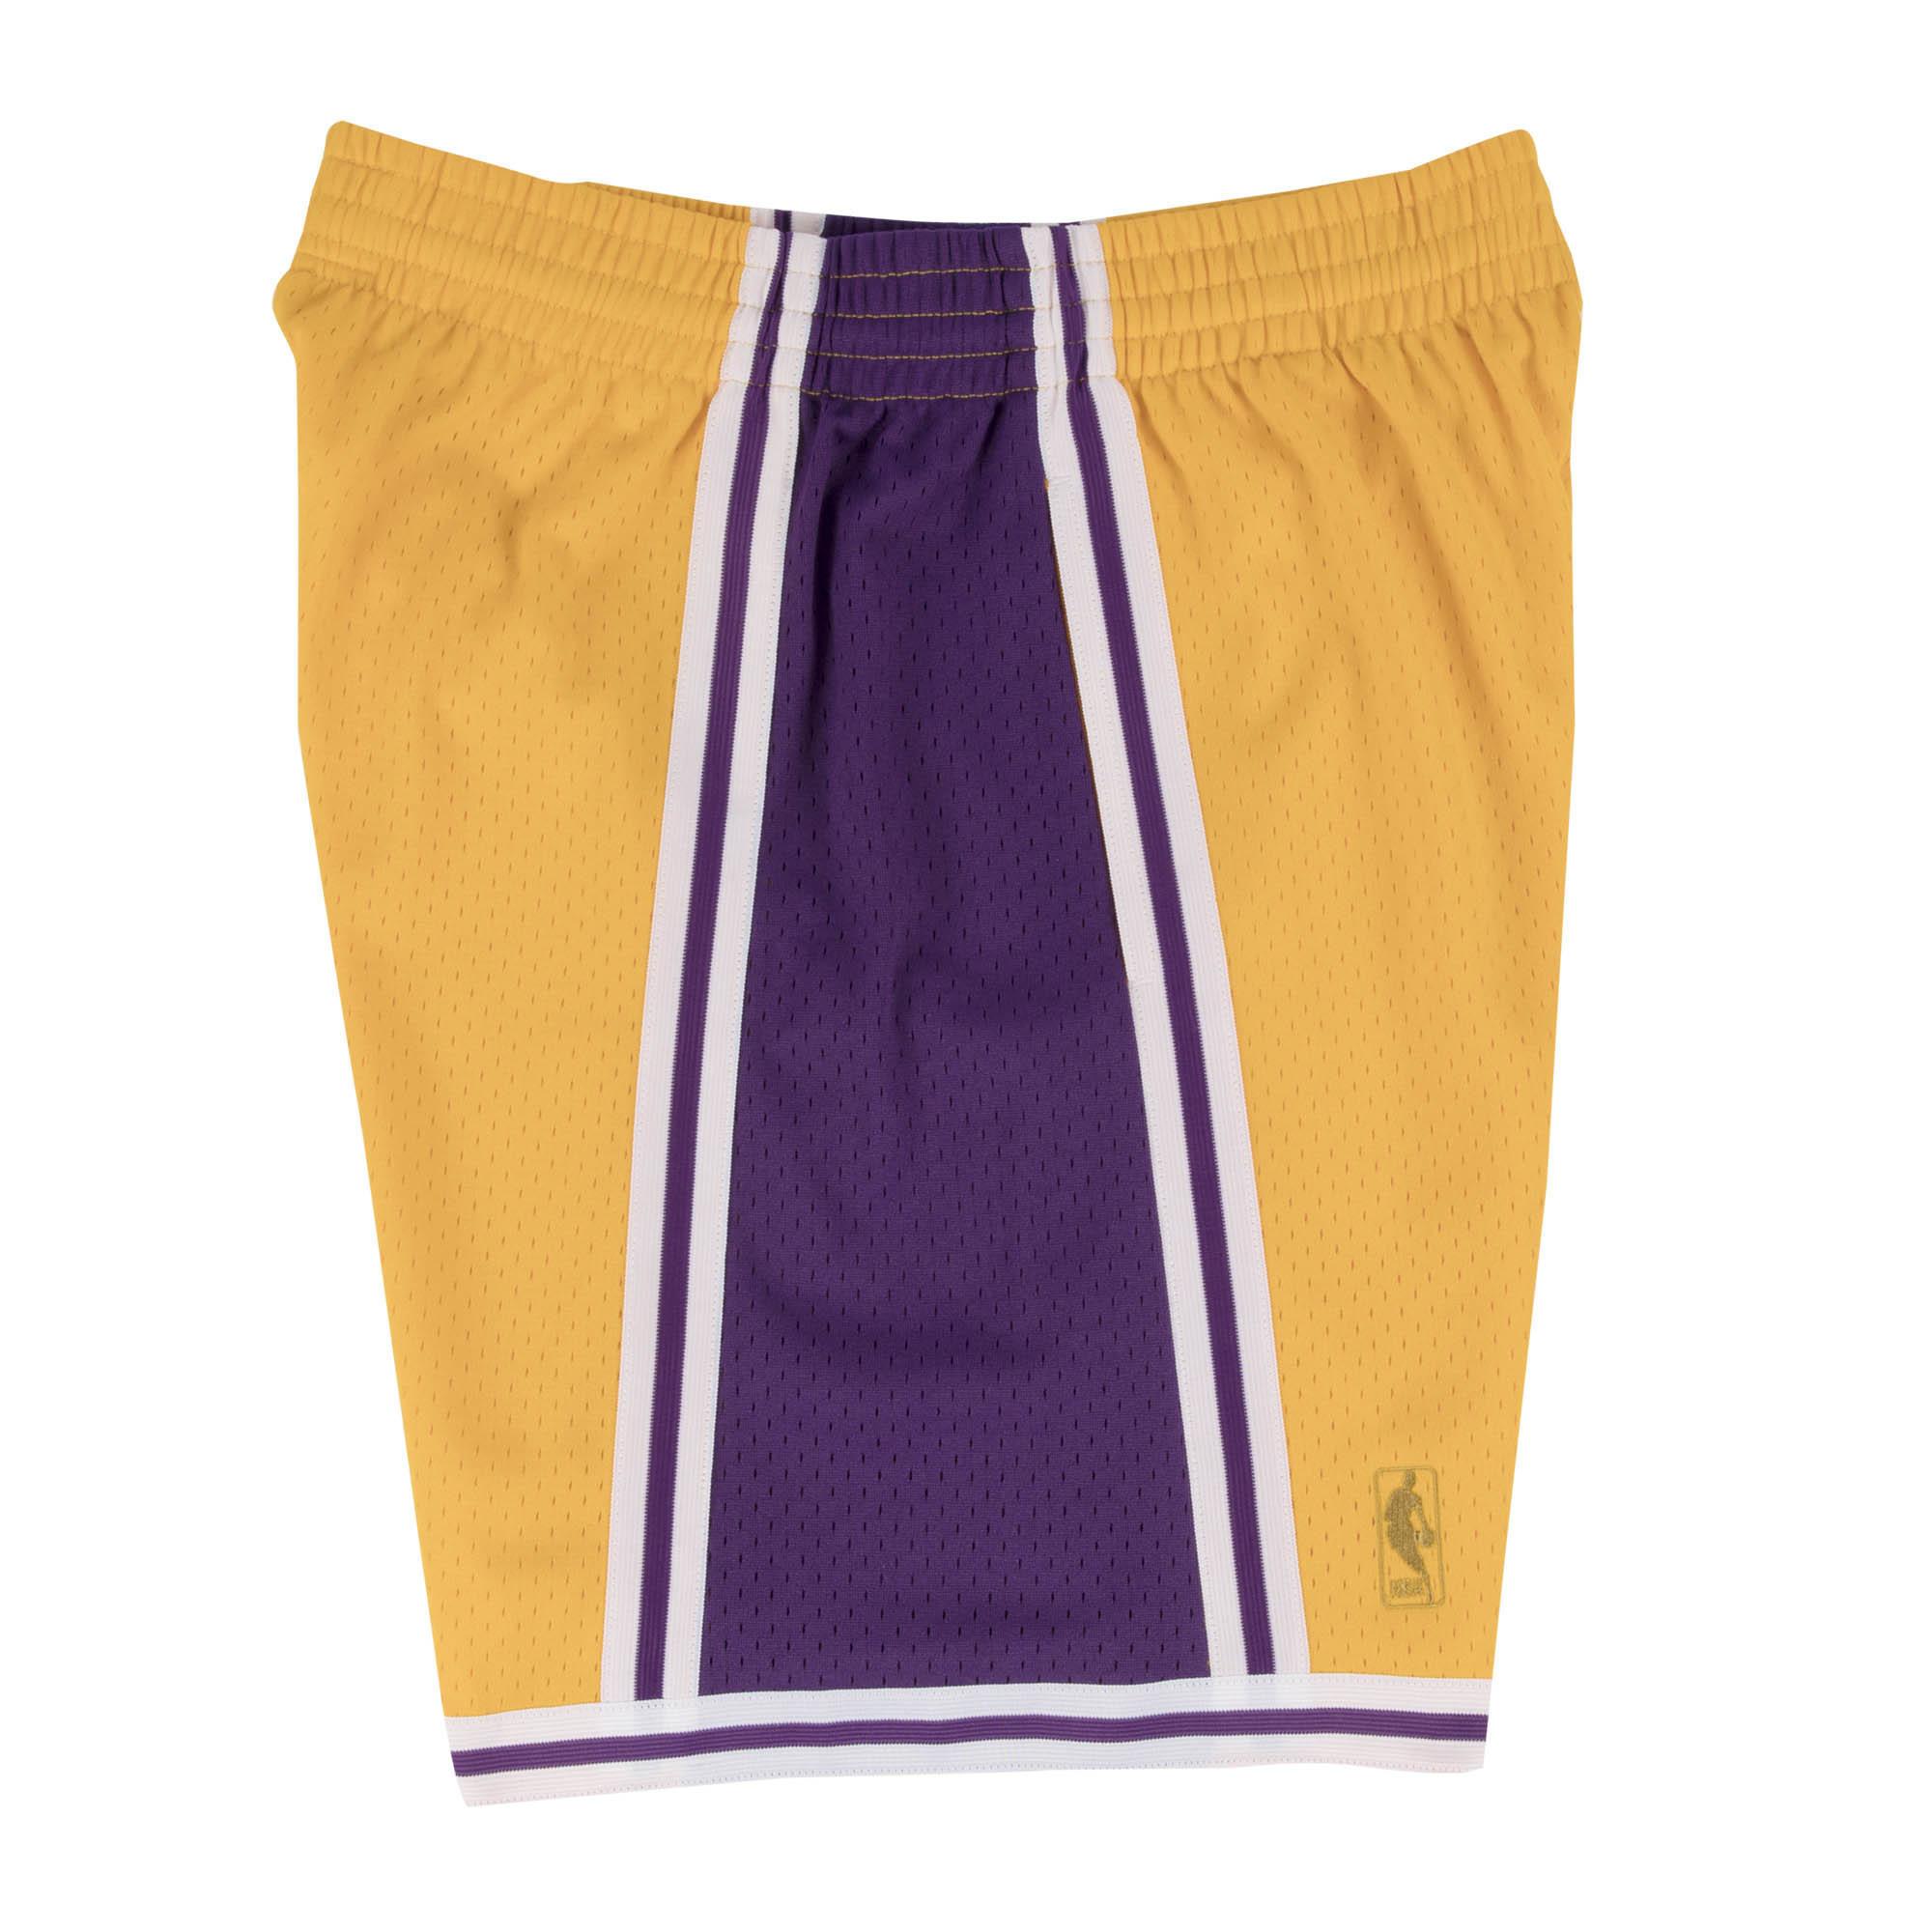 Mitchell & Ness Mitchell & Ness Los Angeles Lakers Youth Gold Swingman Shorts